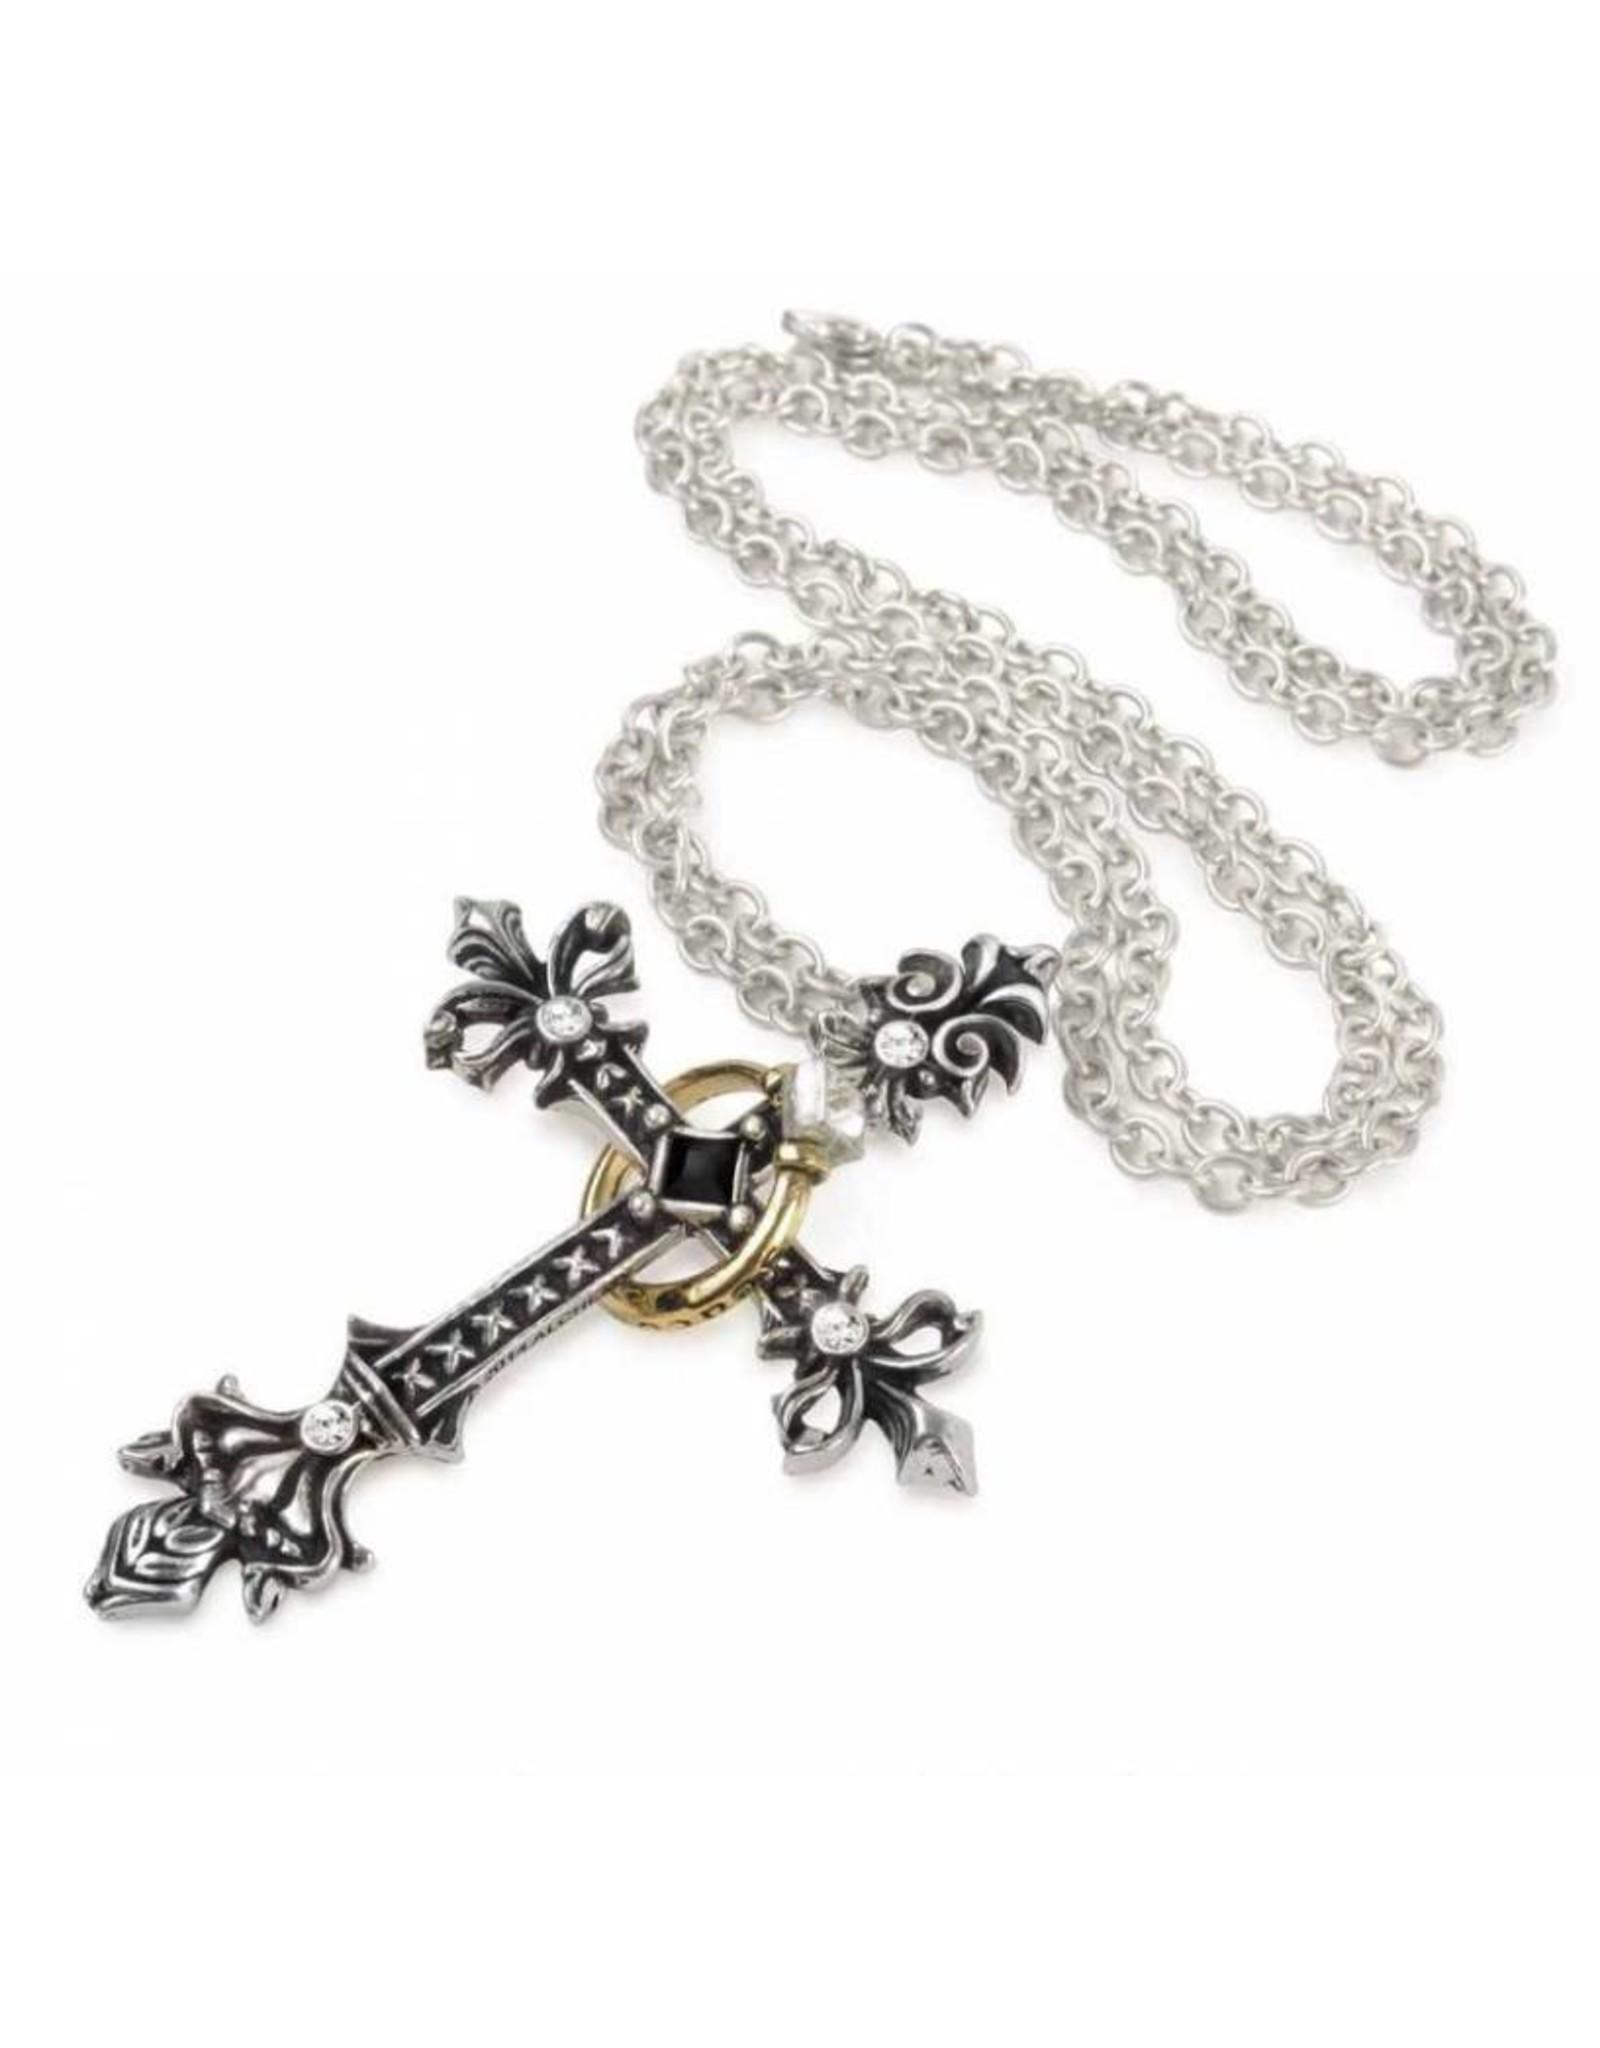 Alchemy Gothic sieraden Steampunk sieraden -  Maryam Theotokos Ring Cross hanger en ketting Alchemy